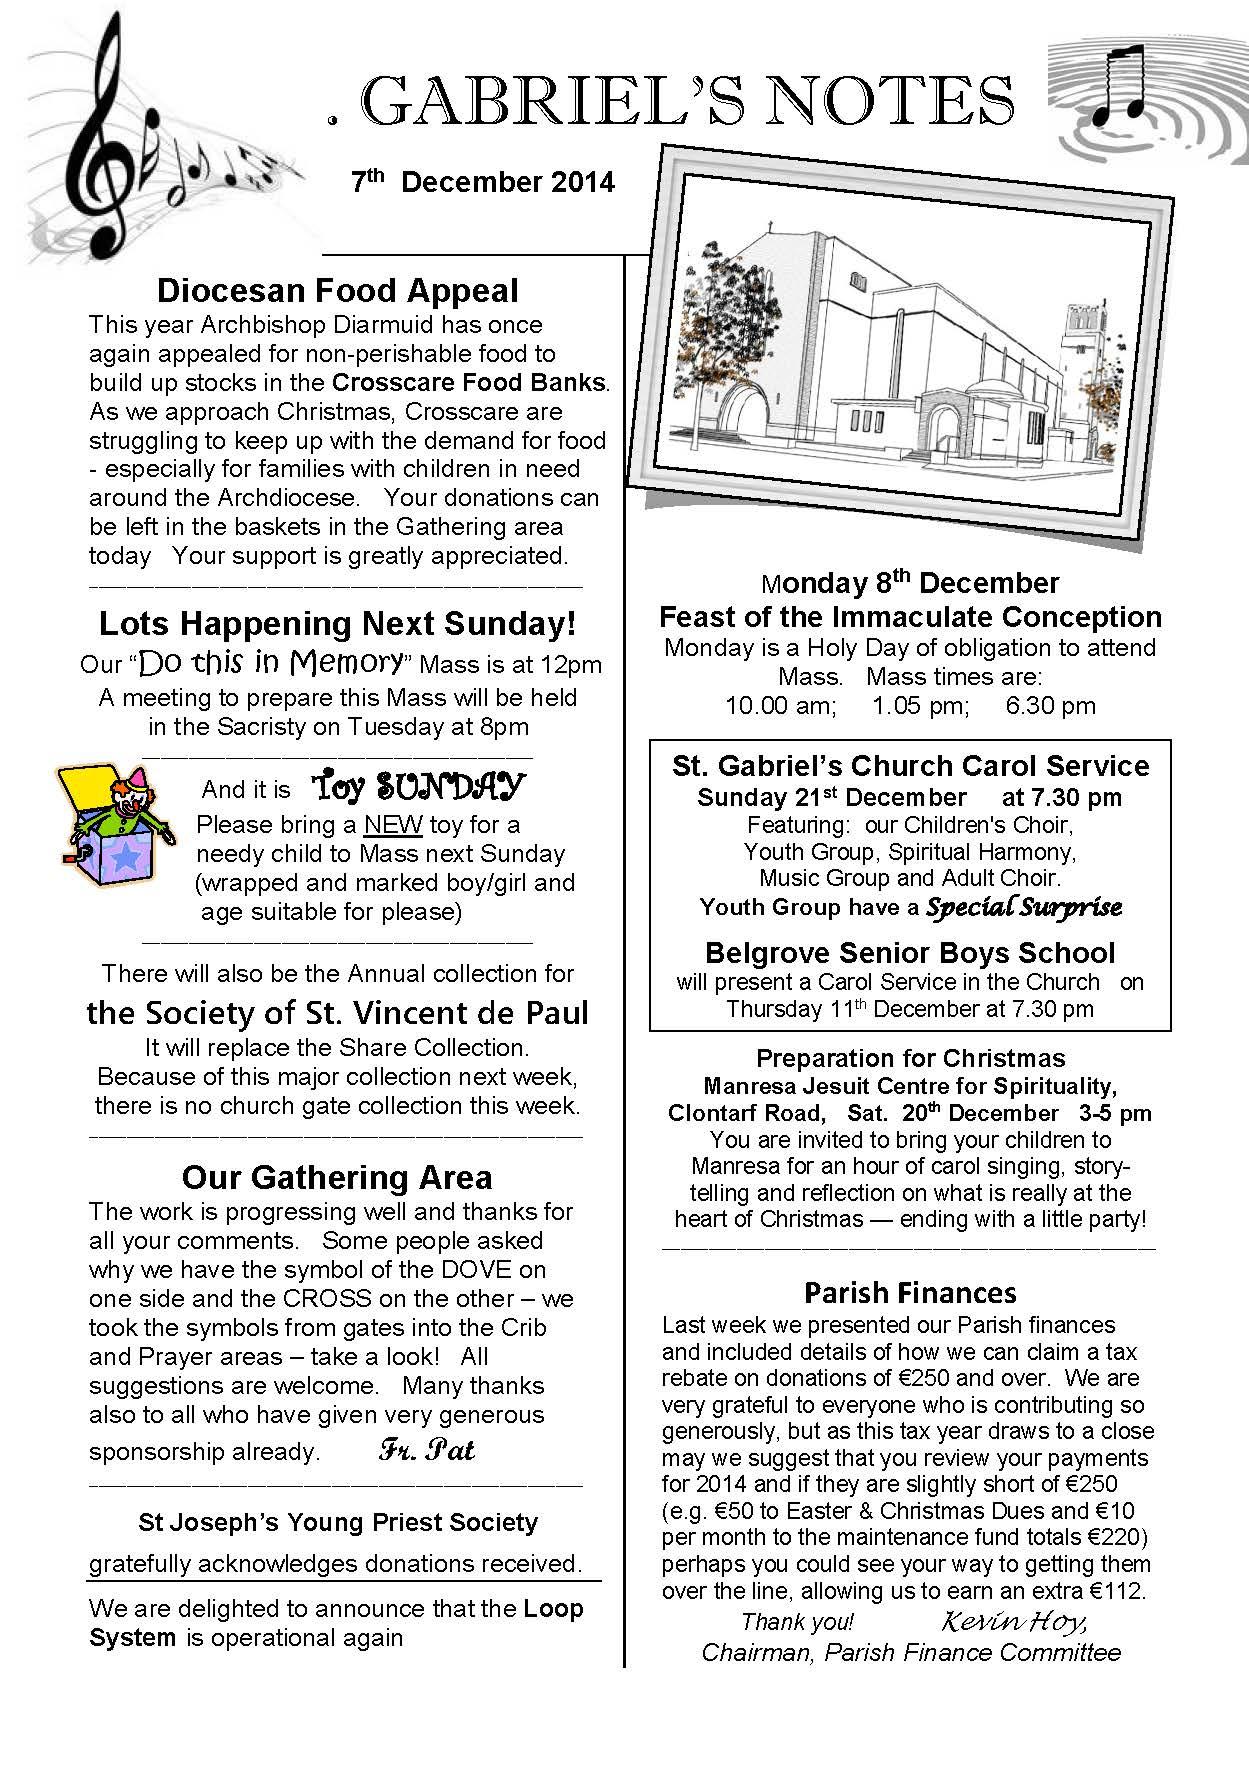 St Gabriels Parish Page 21 The Website Of The Parish Of St Gabriel